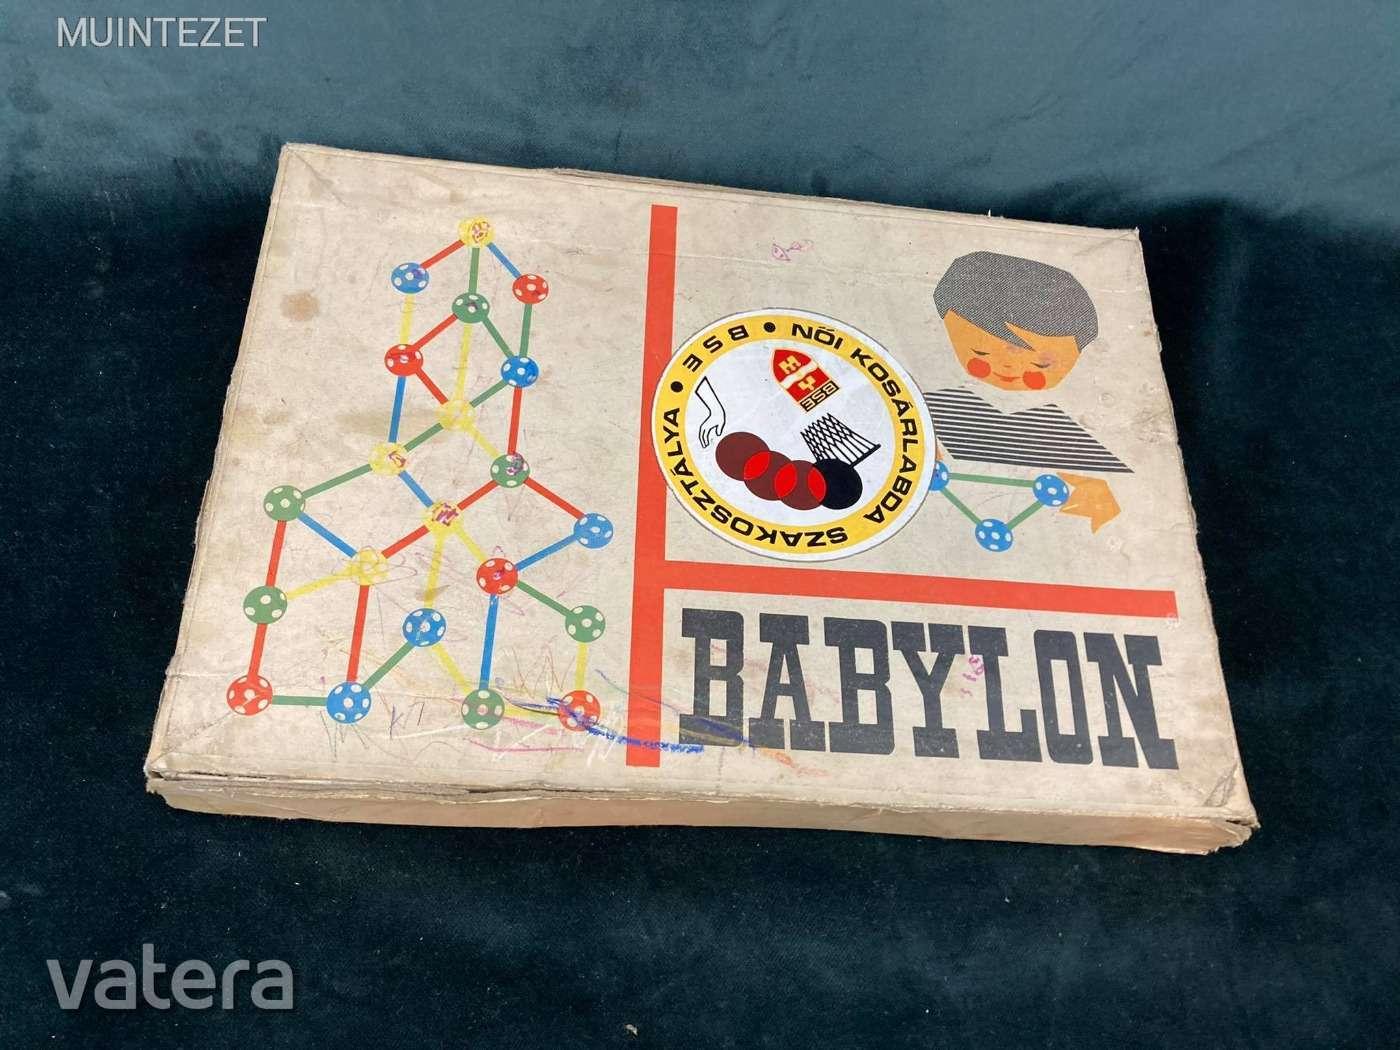 retro-tarsasjatek-eredeti-dobozaban-babylon-epitojatek-1960-as-evek-116b_3_big.jpg